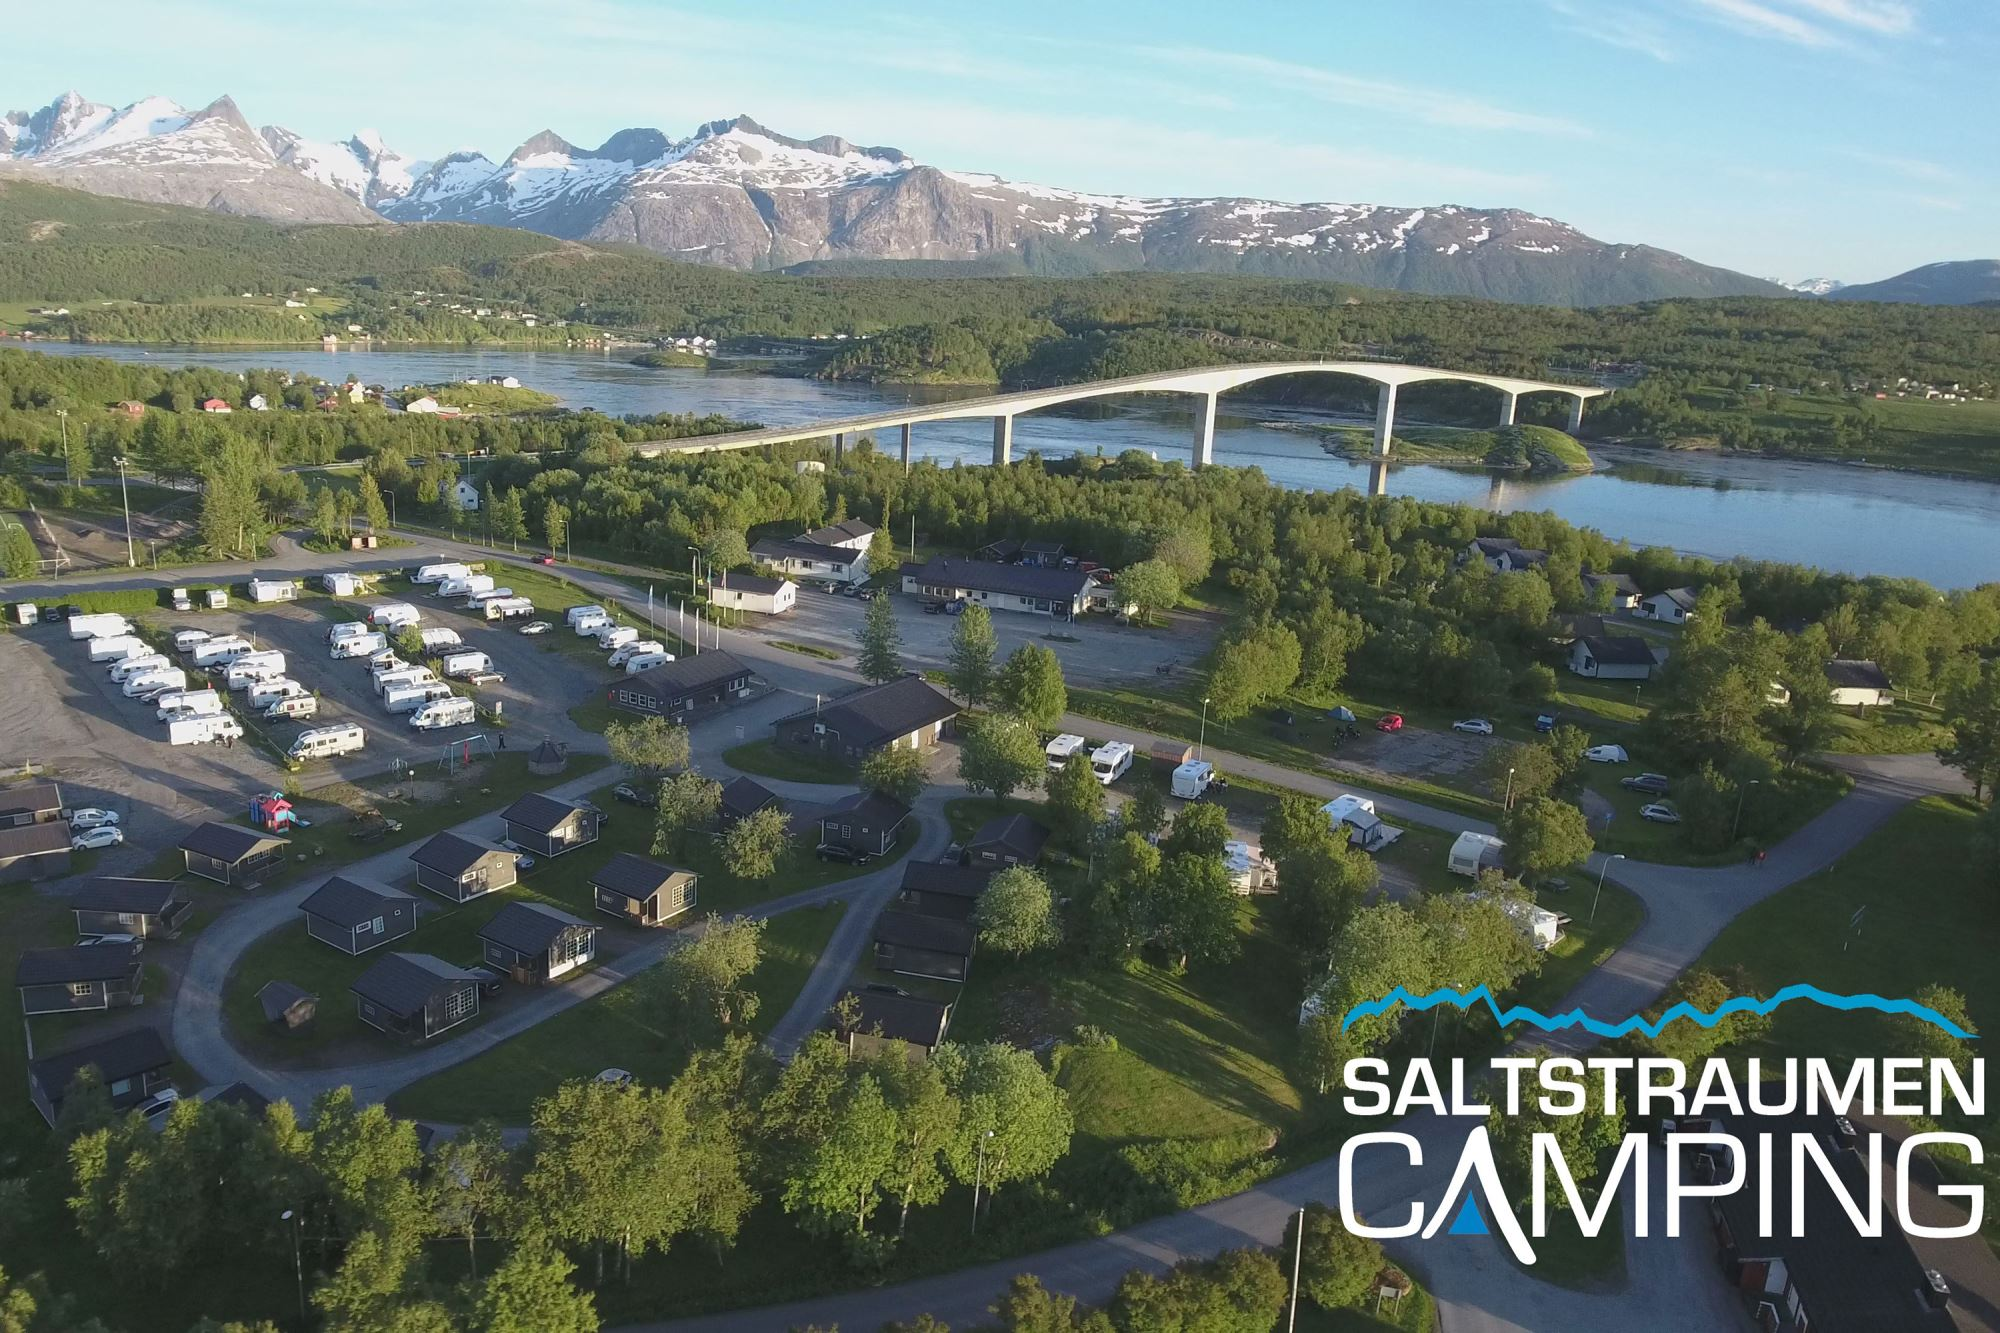 Saltstraumen camping